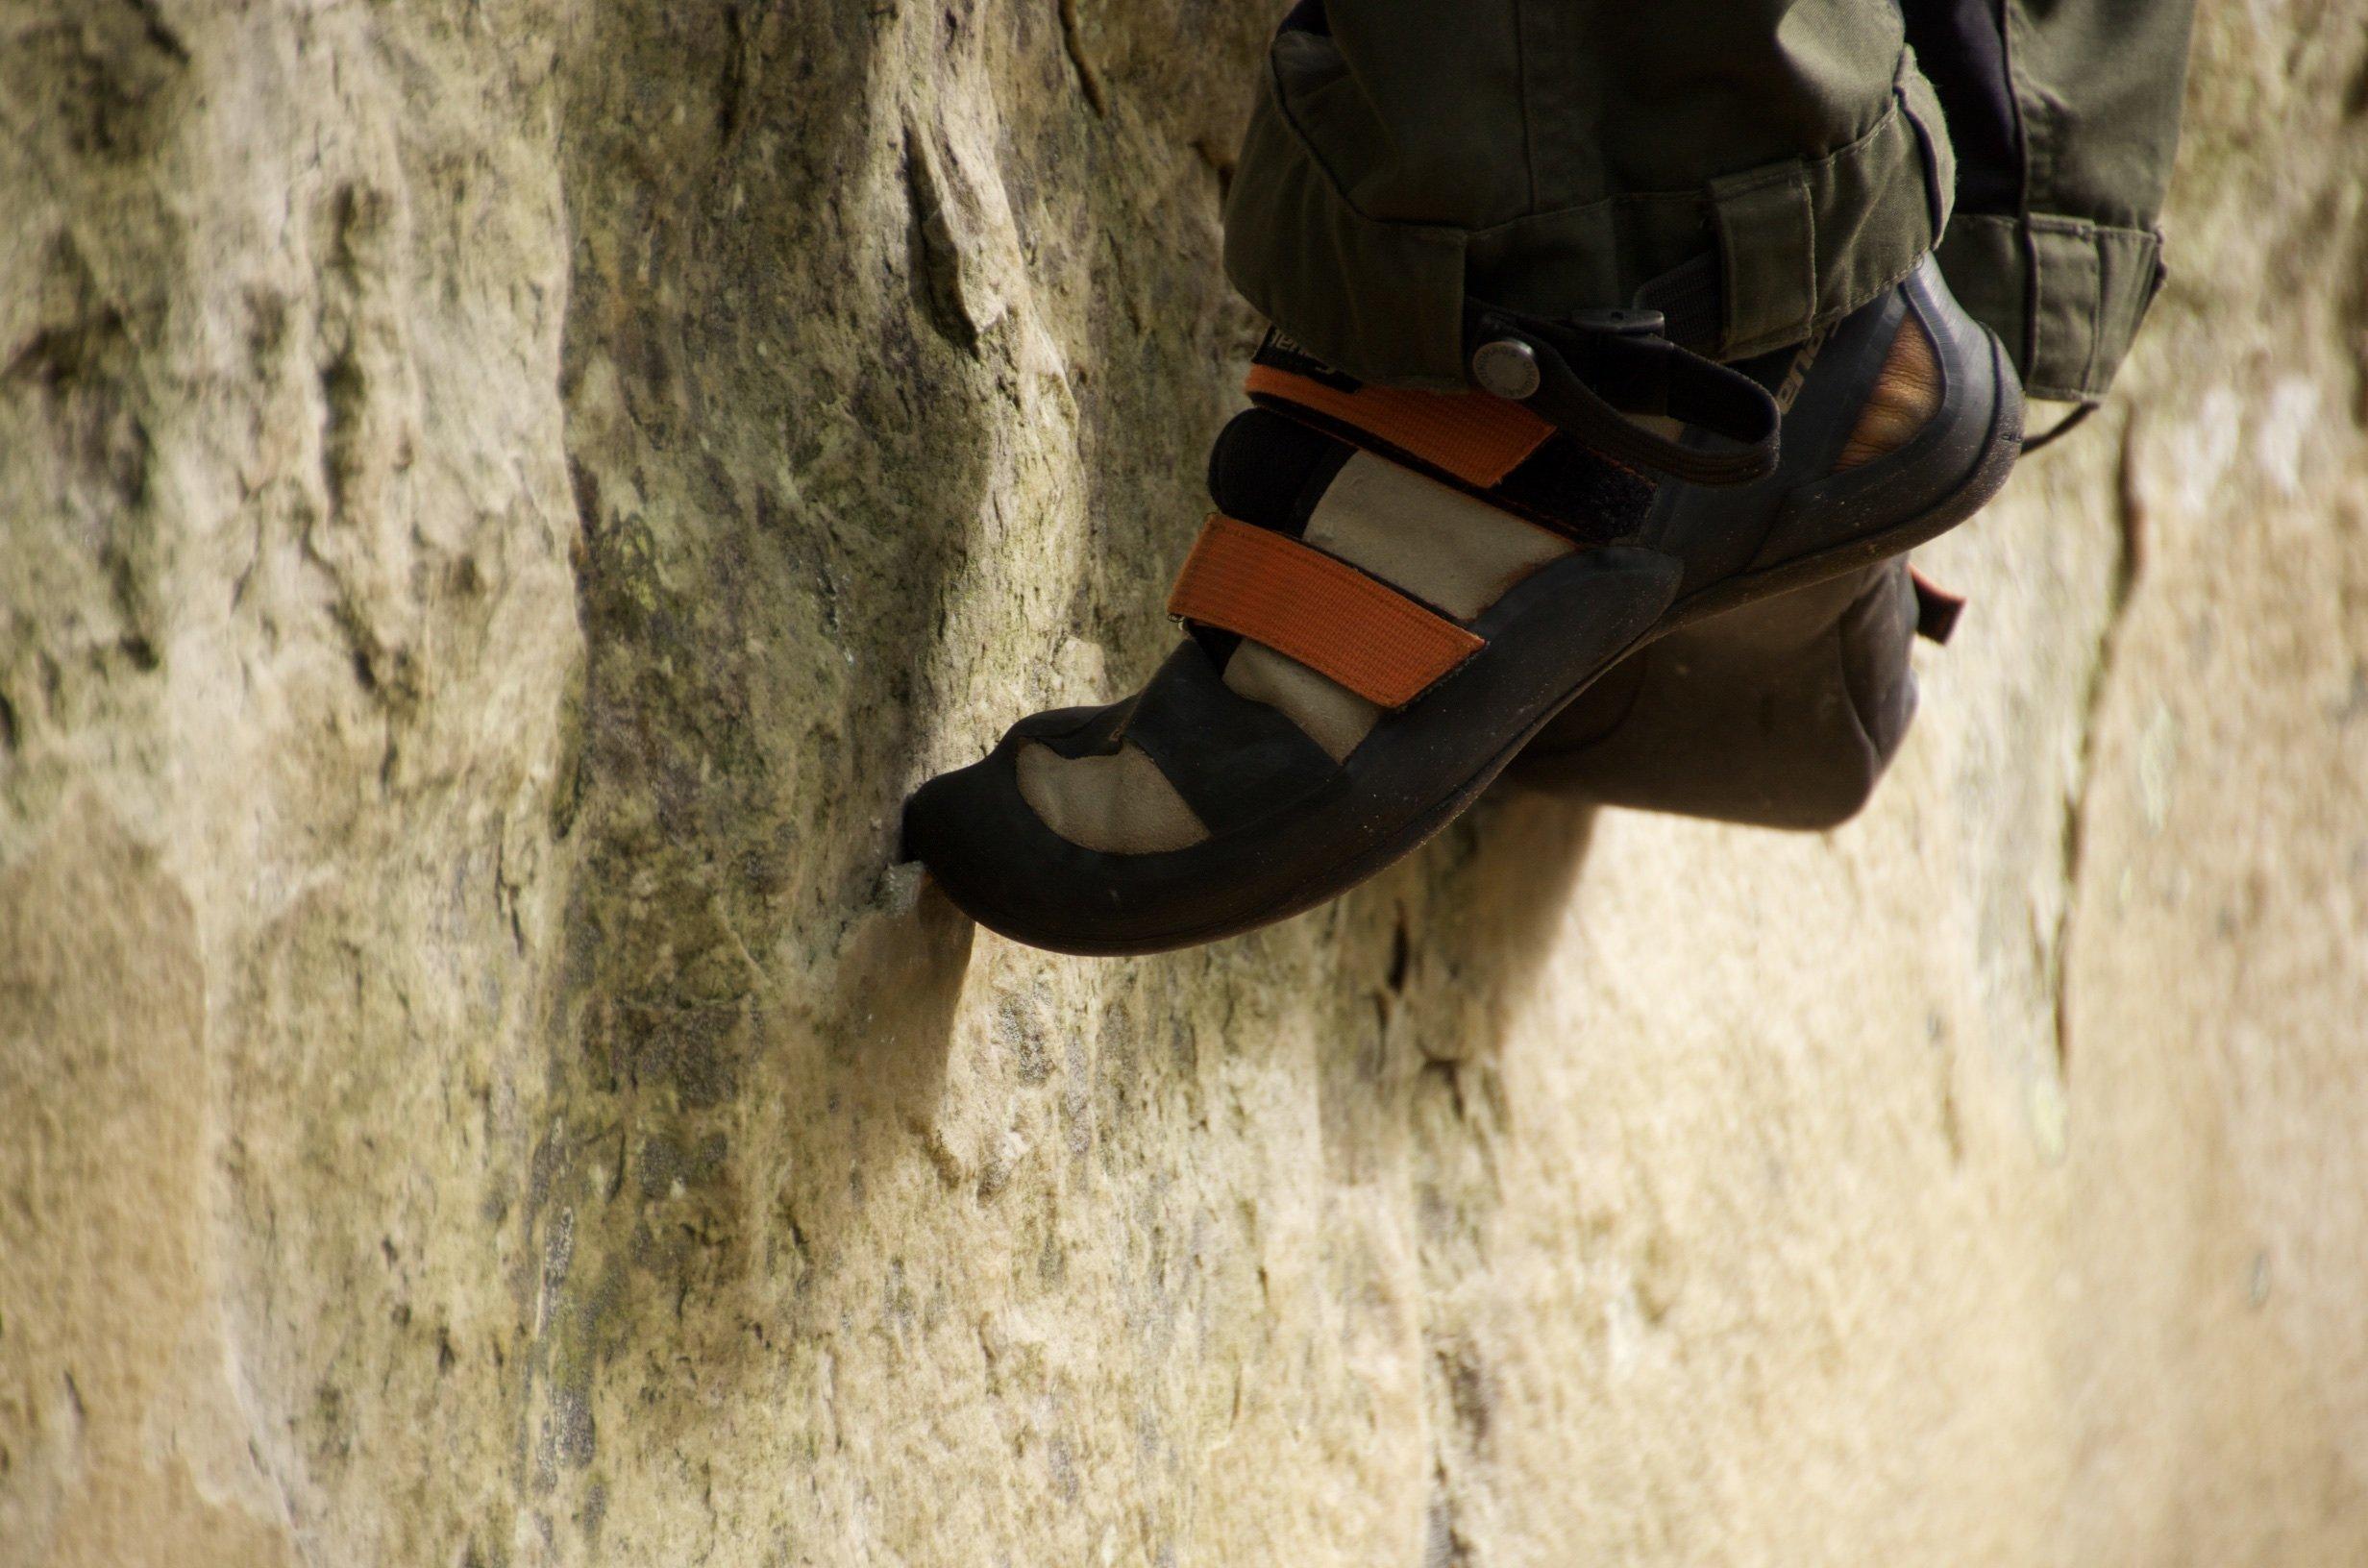 Ein Schuh an der Wand (Foto: Stefan)